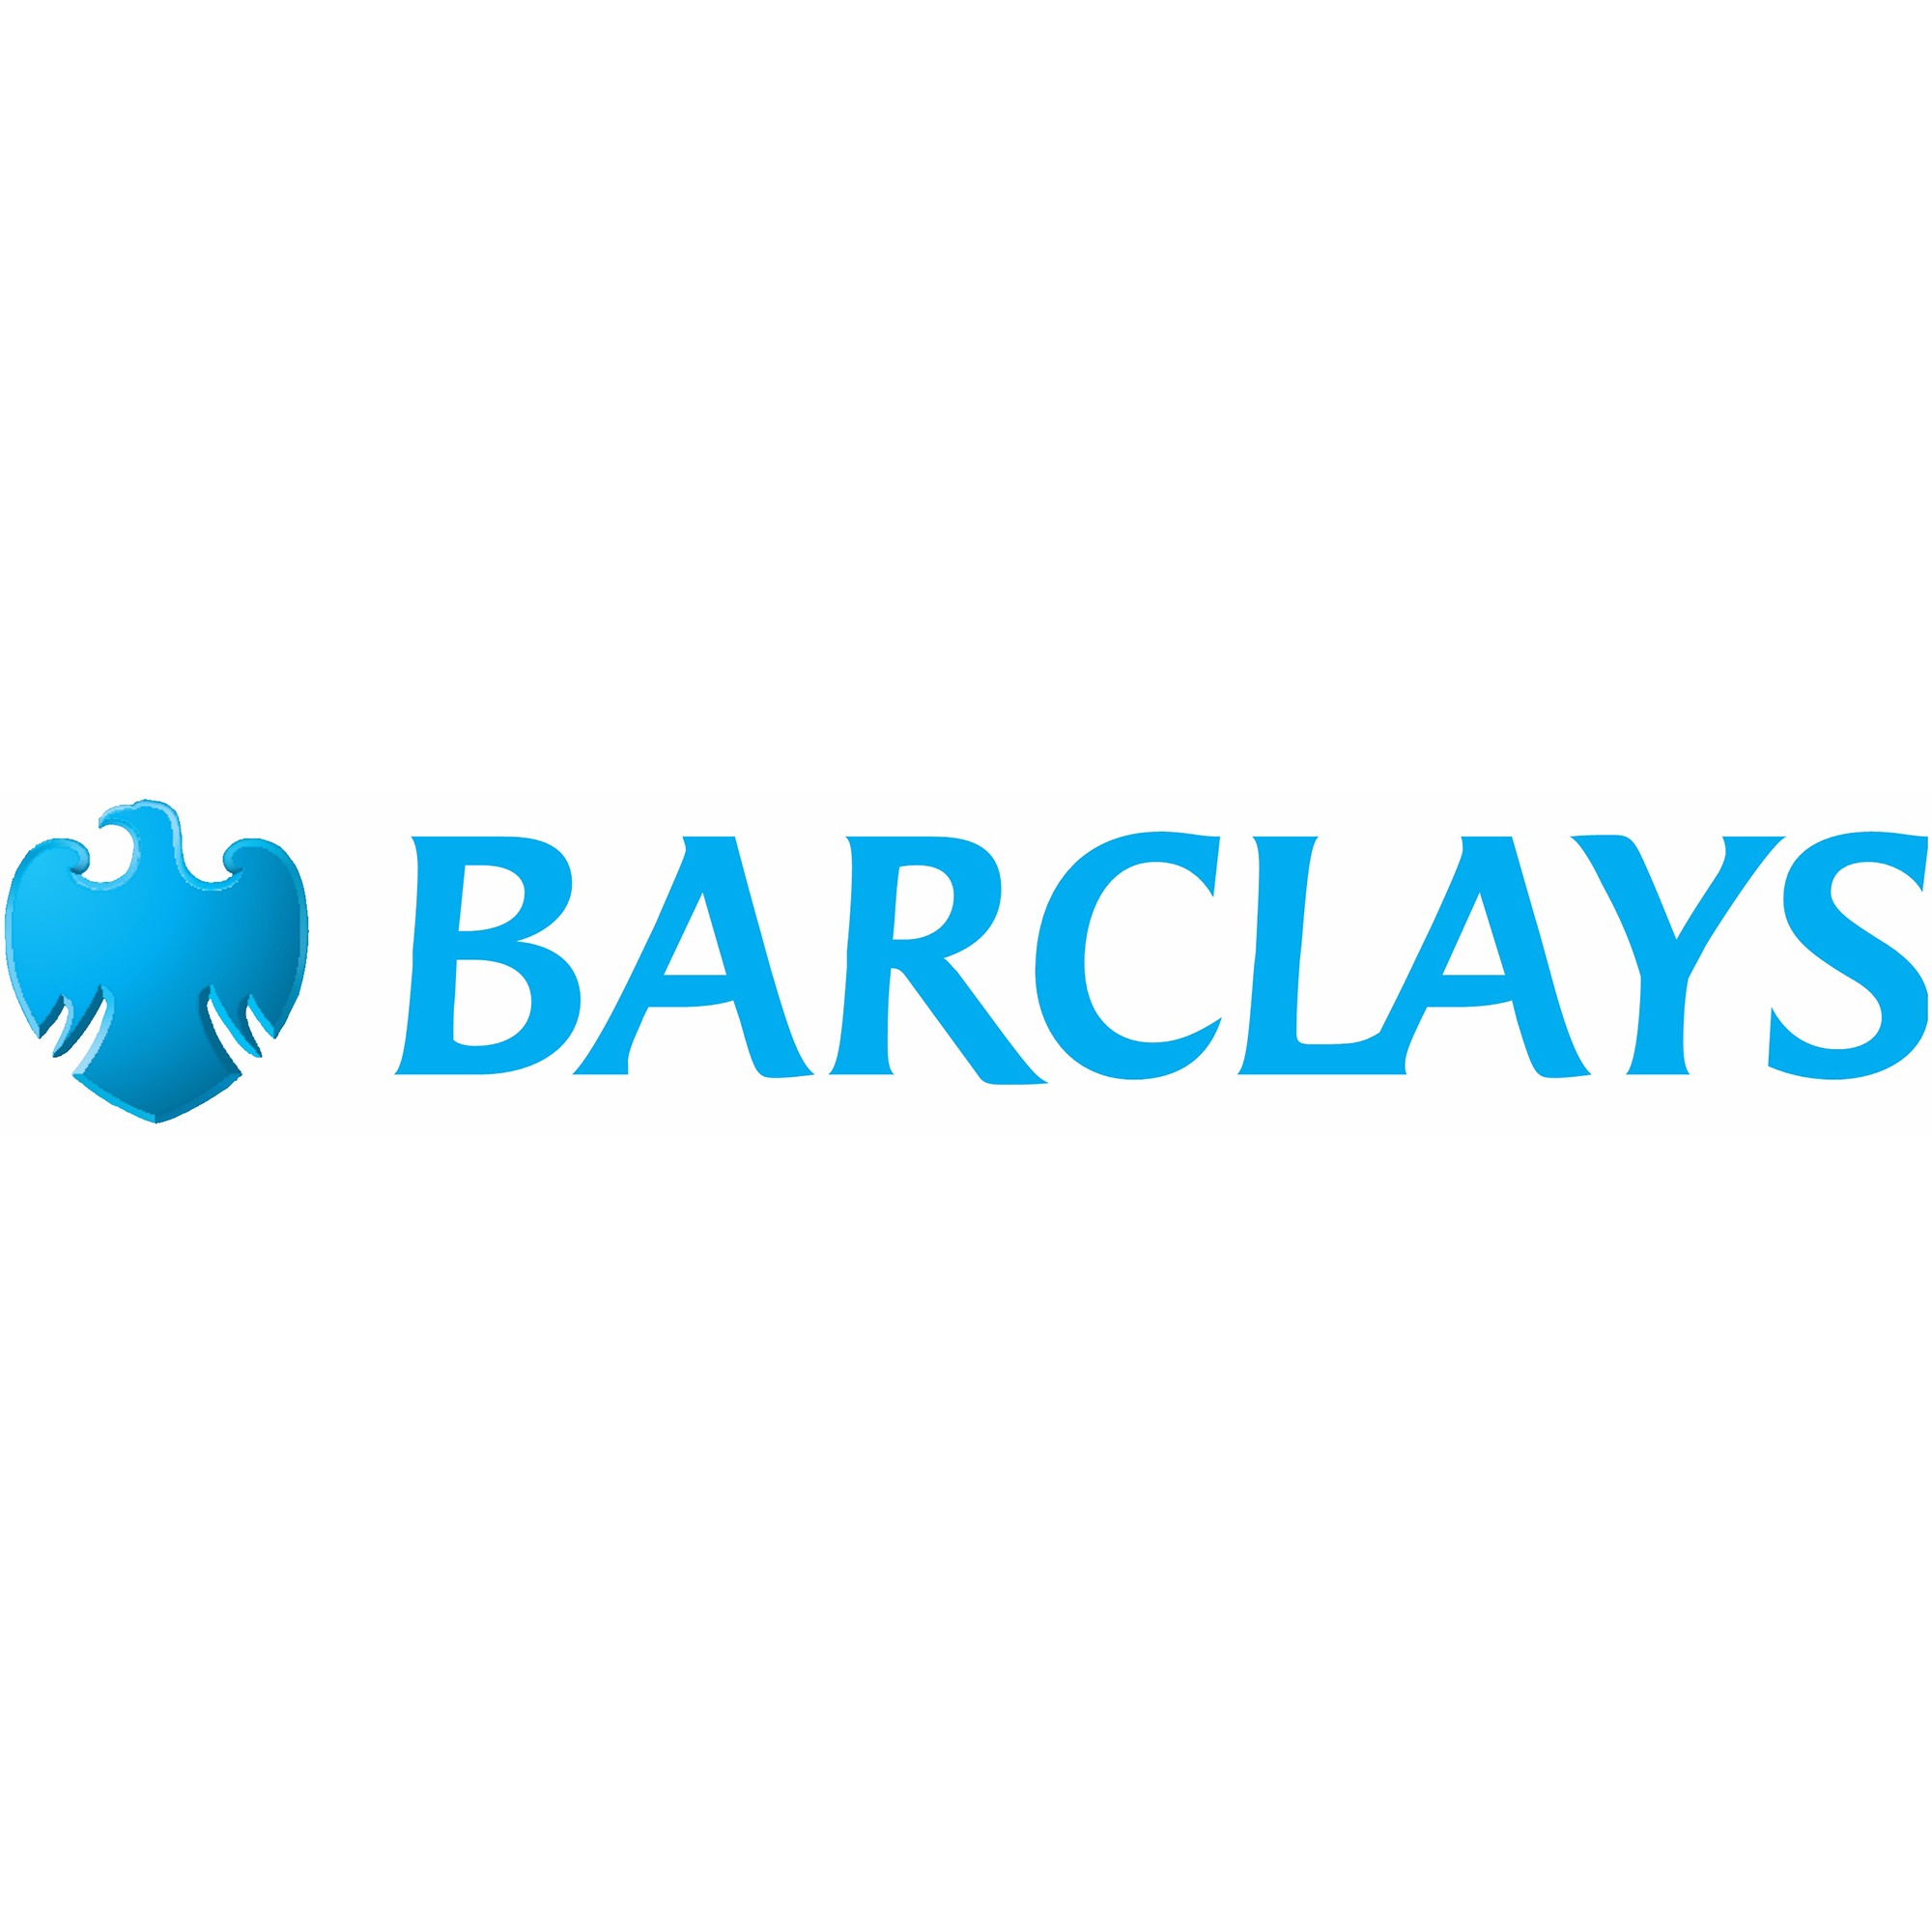 the Barclays logo.